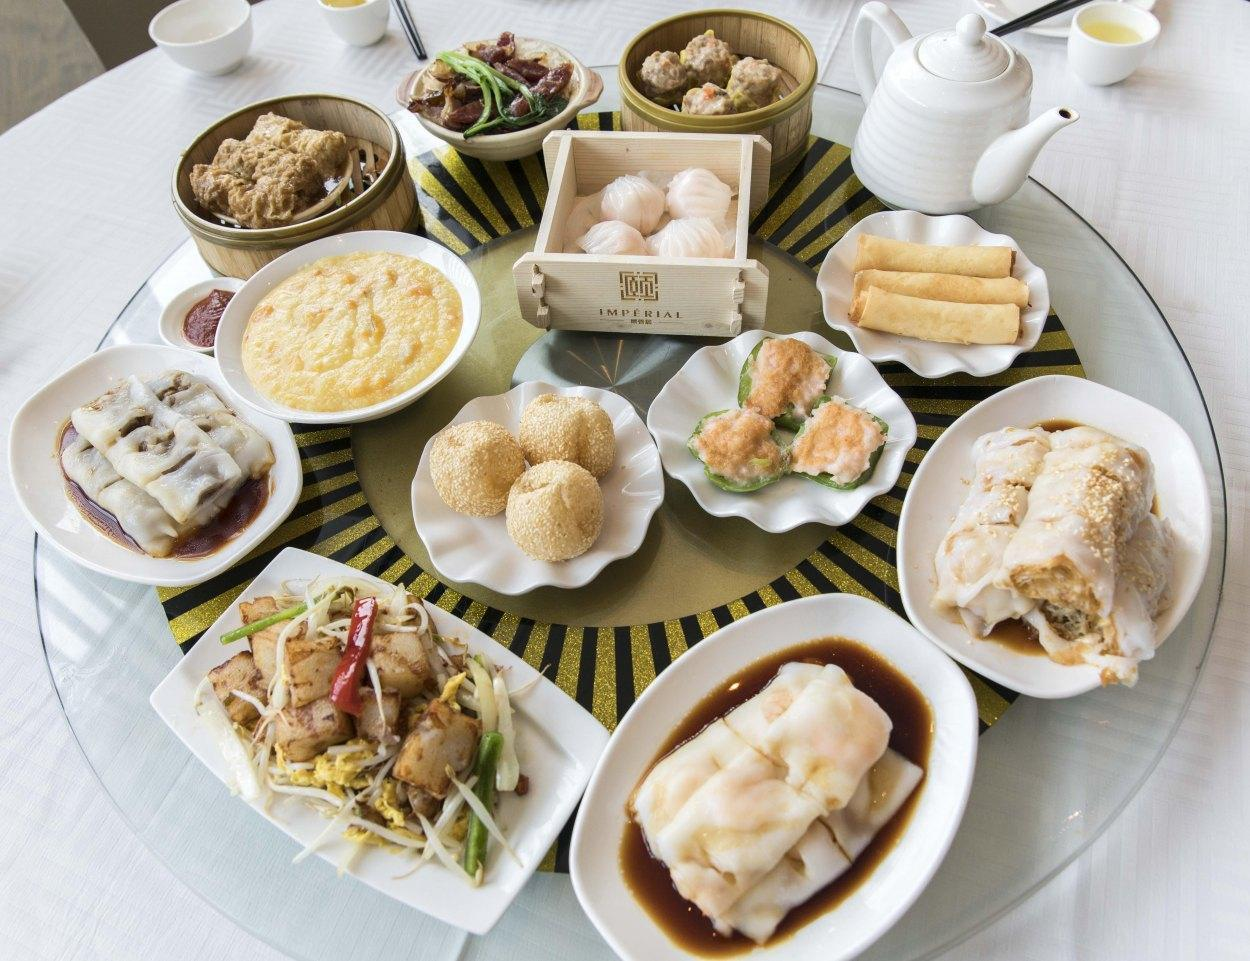 Kleinbettingen restaurant chinois livraison gabon vs angola bettingexpert tennis